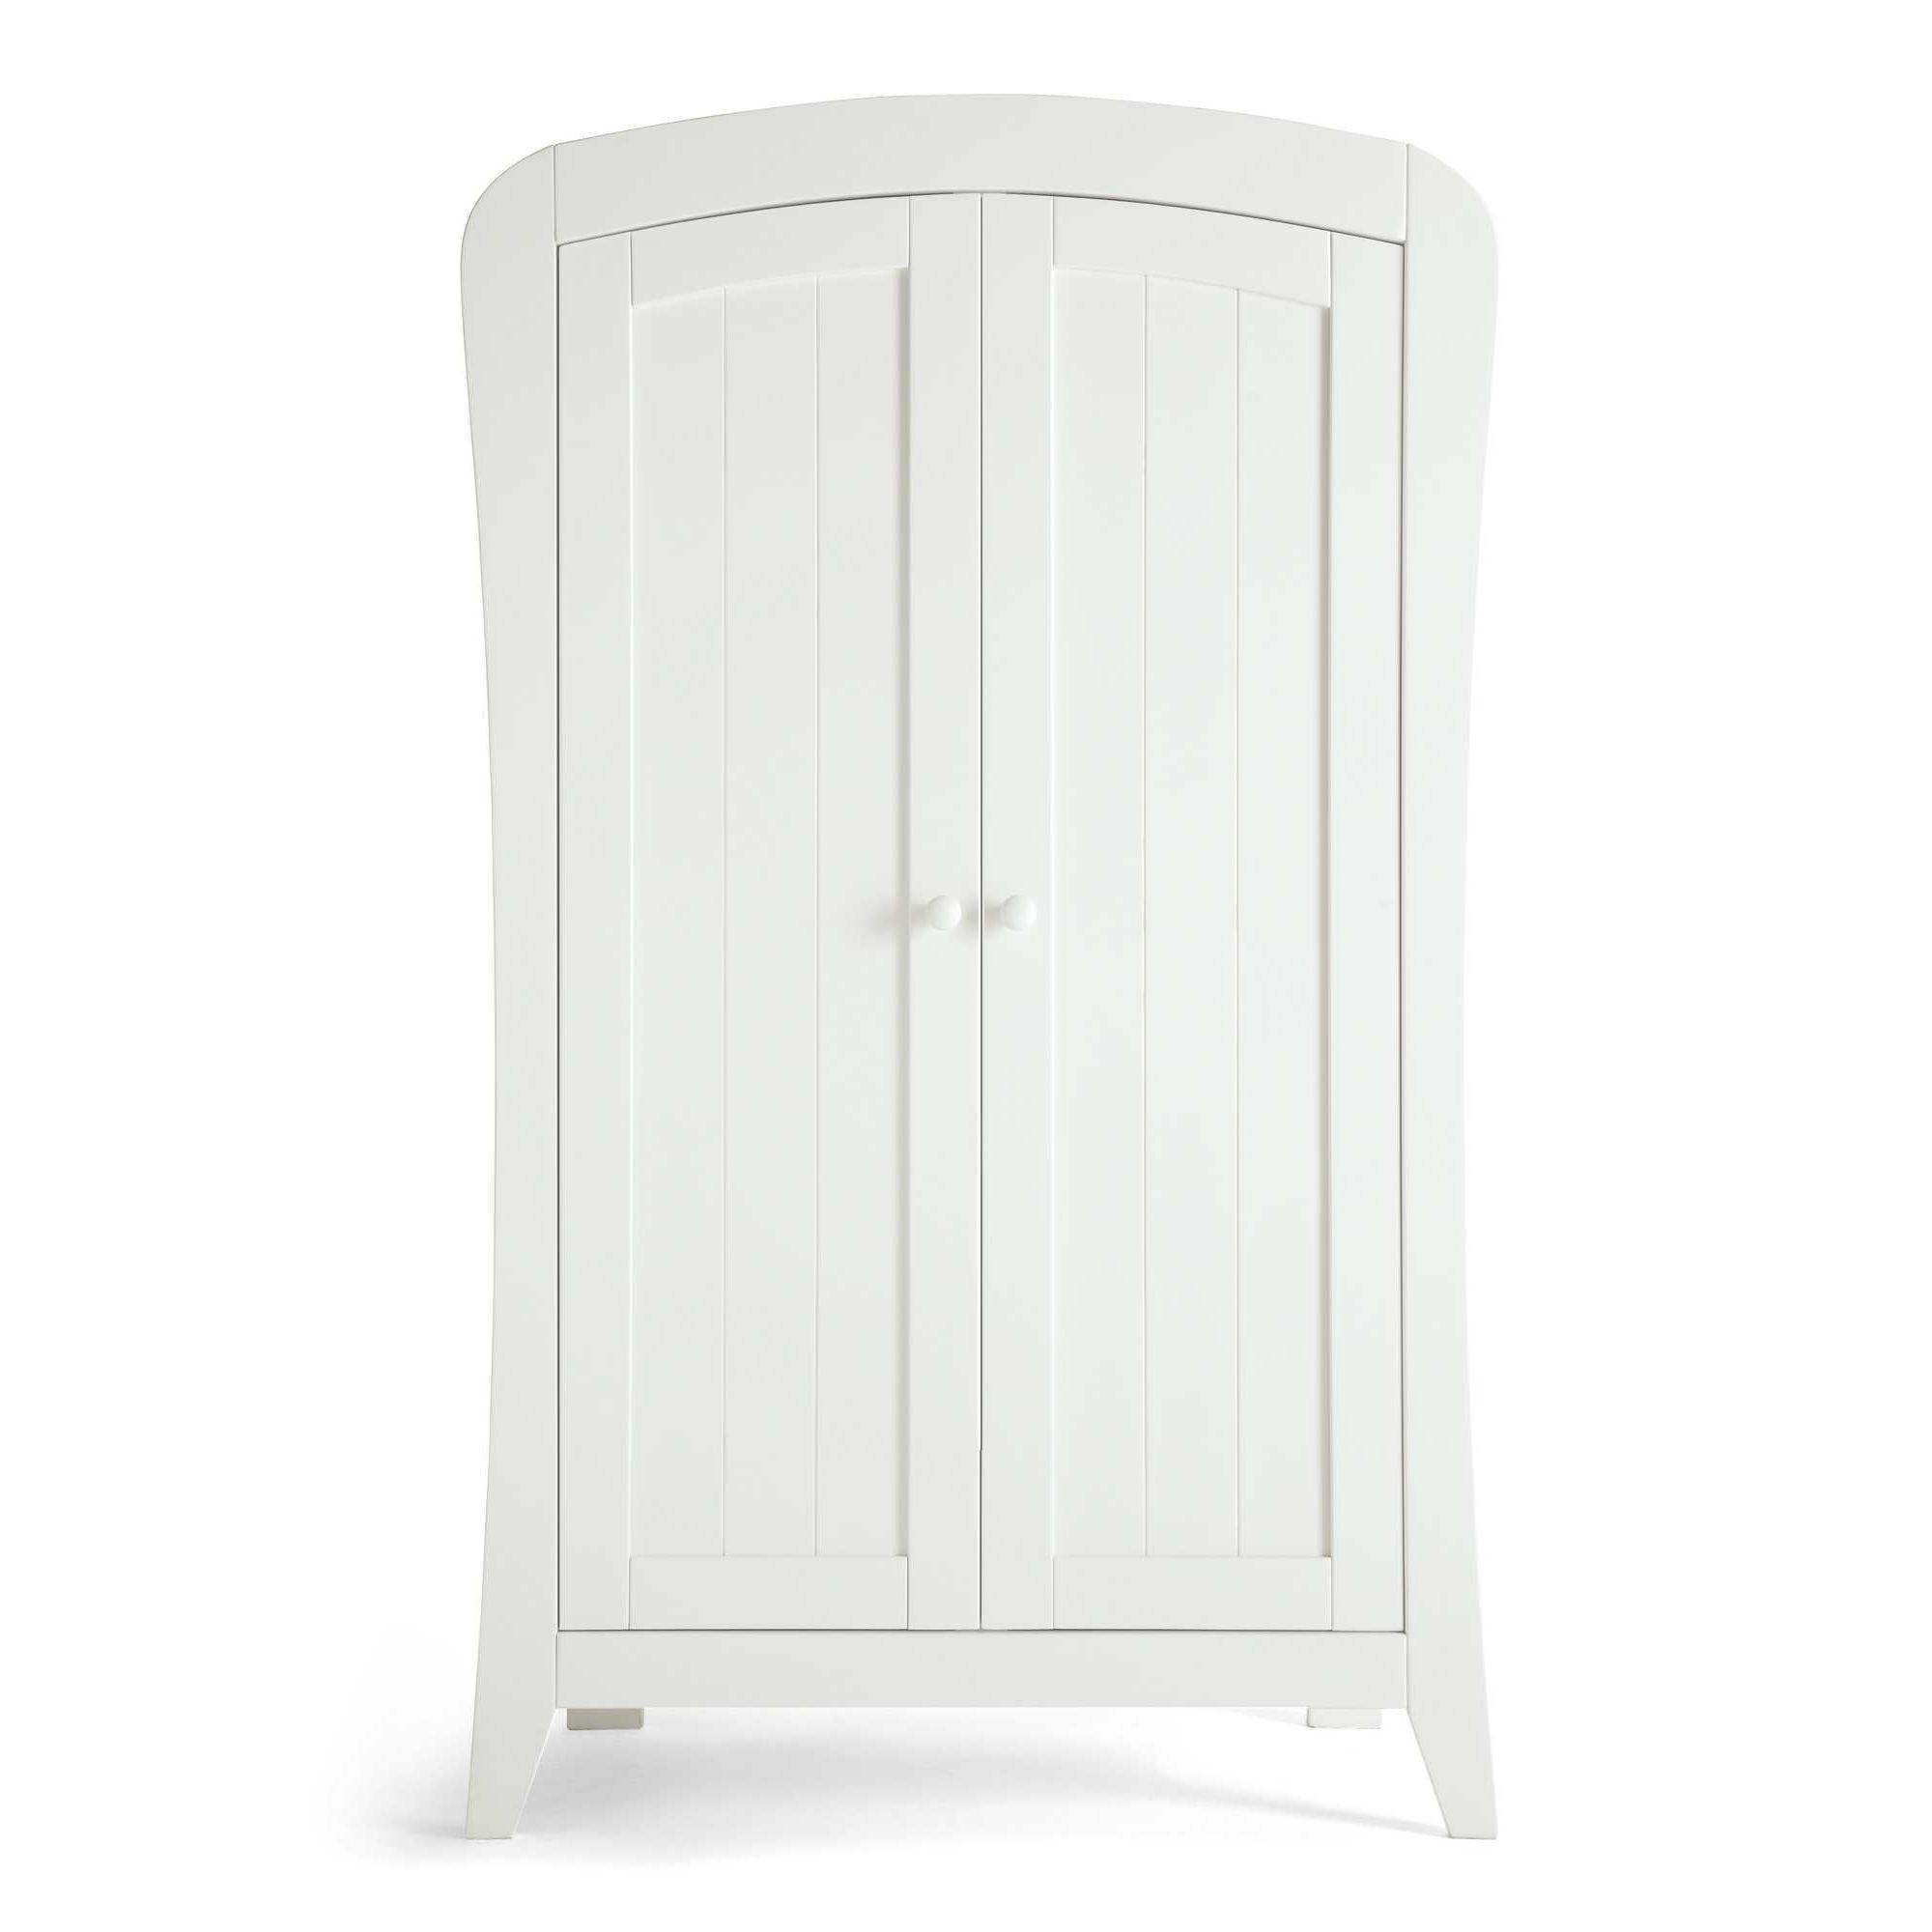 Mamas & Papas - Fern White - Wardrobe at Tesco Direct